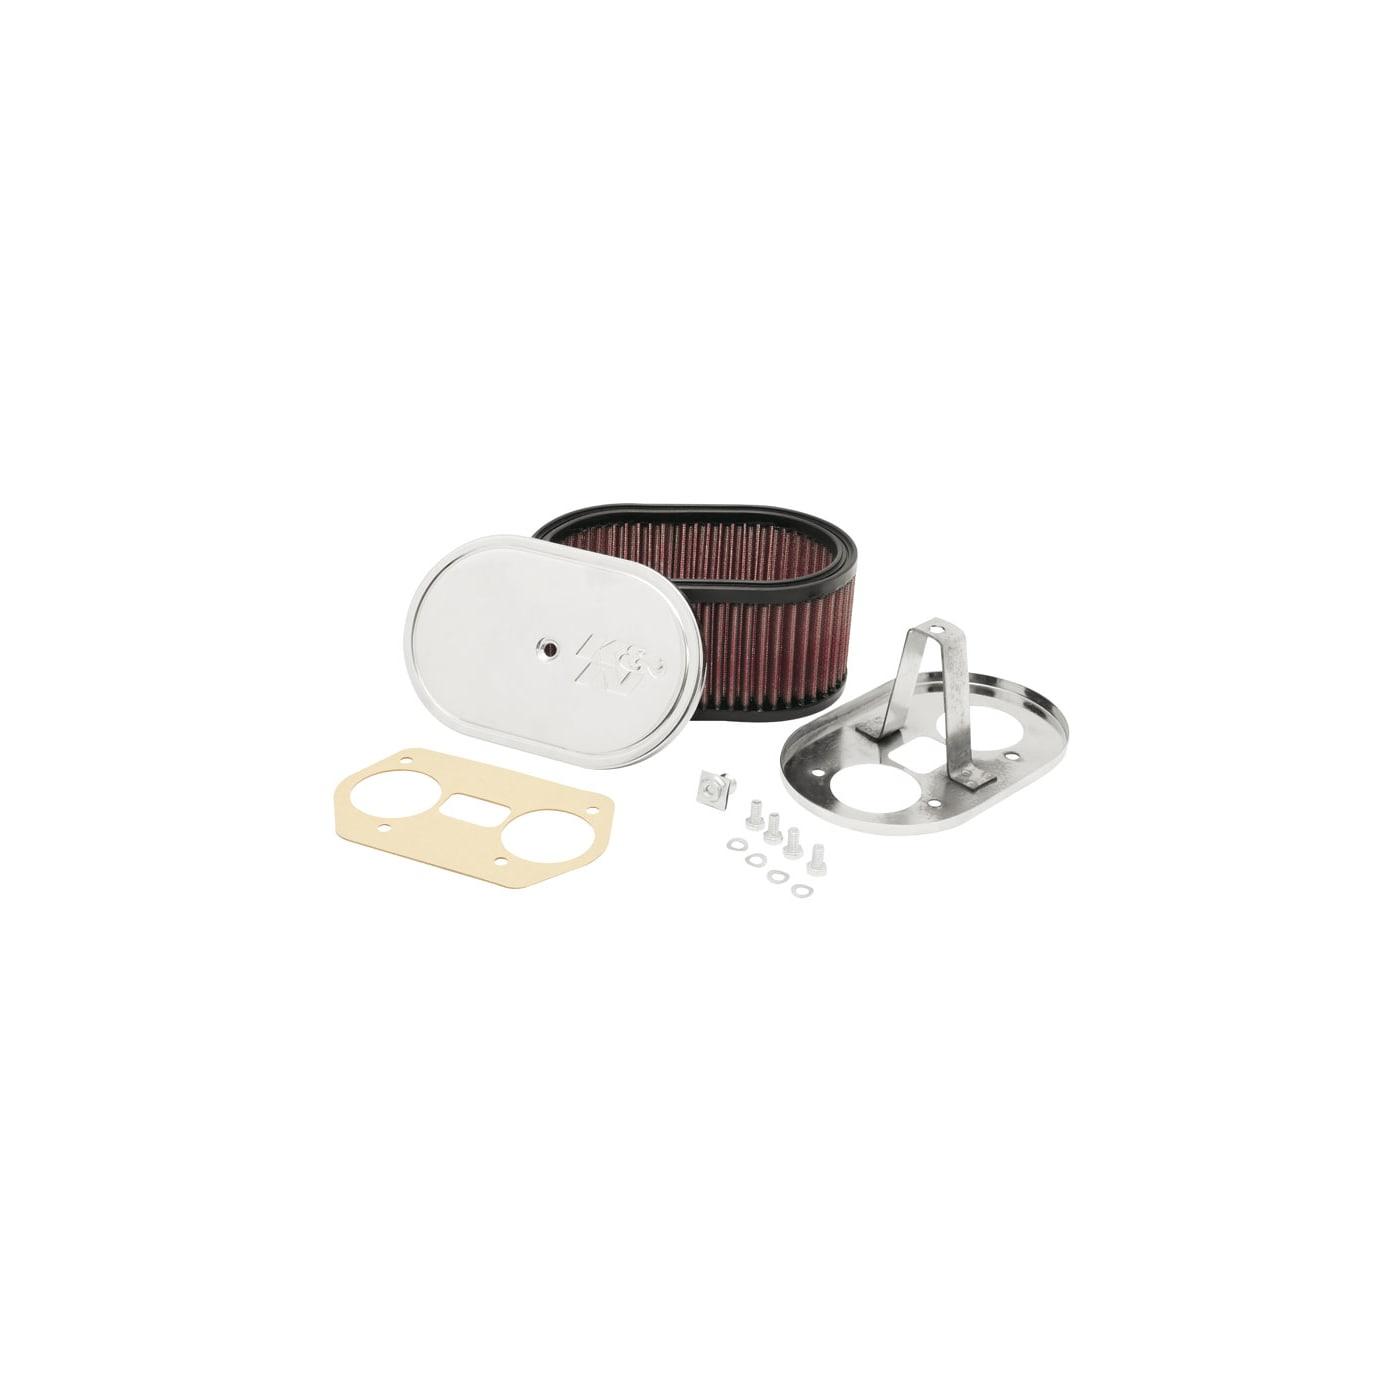 K/&N E-3341 High Performance Custom Air Filter